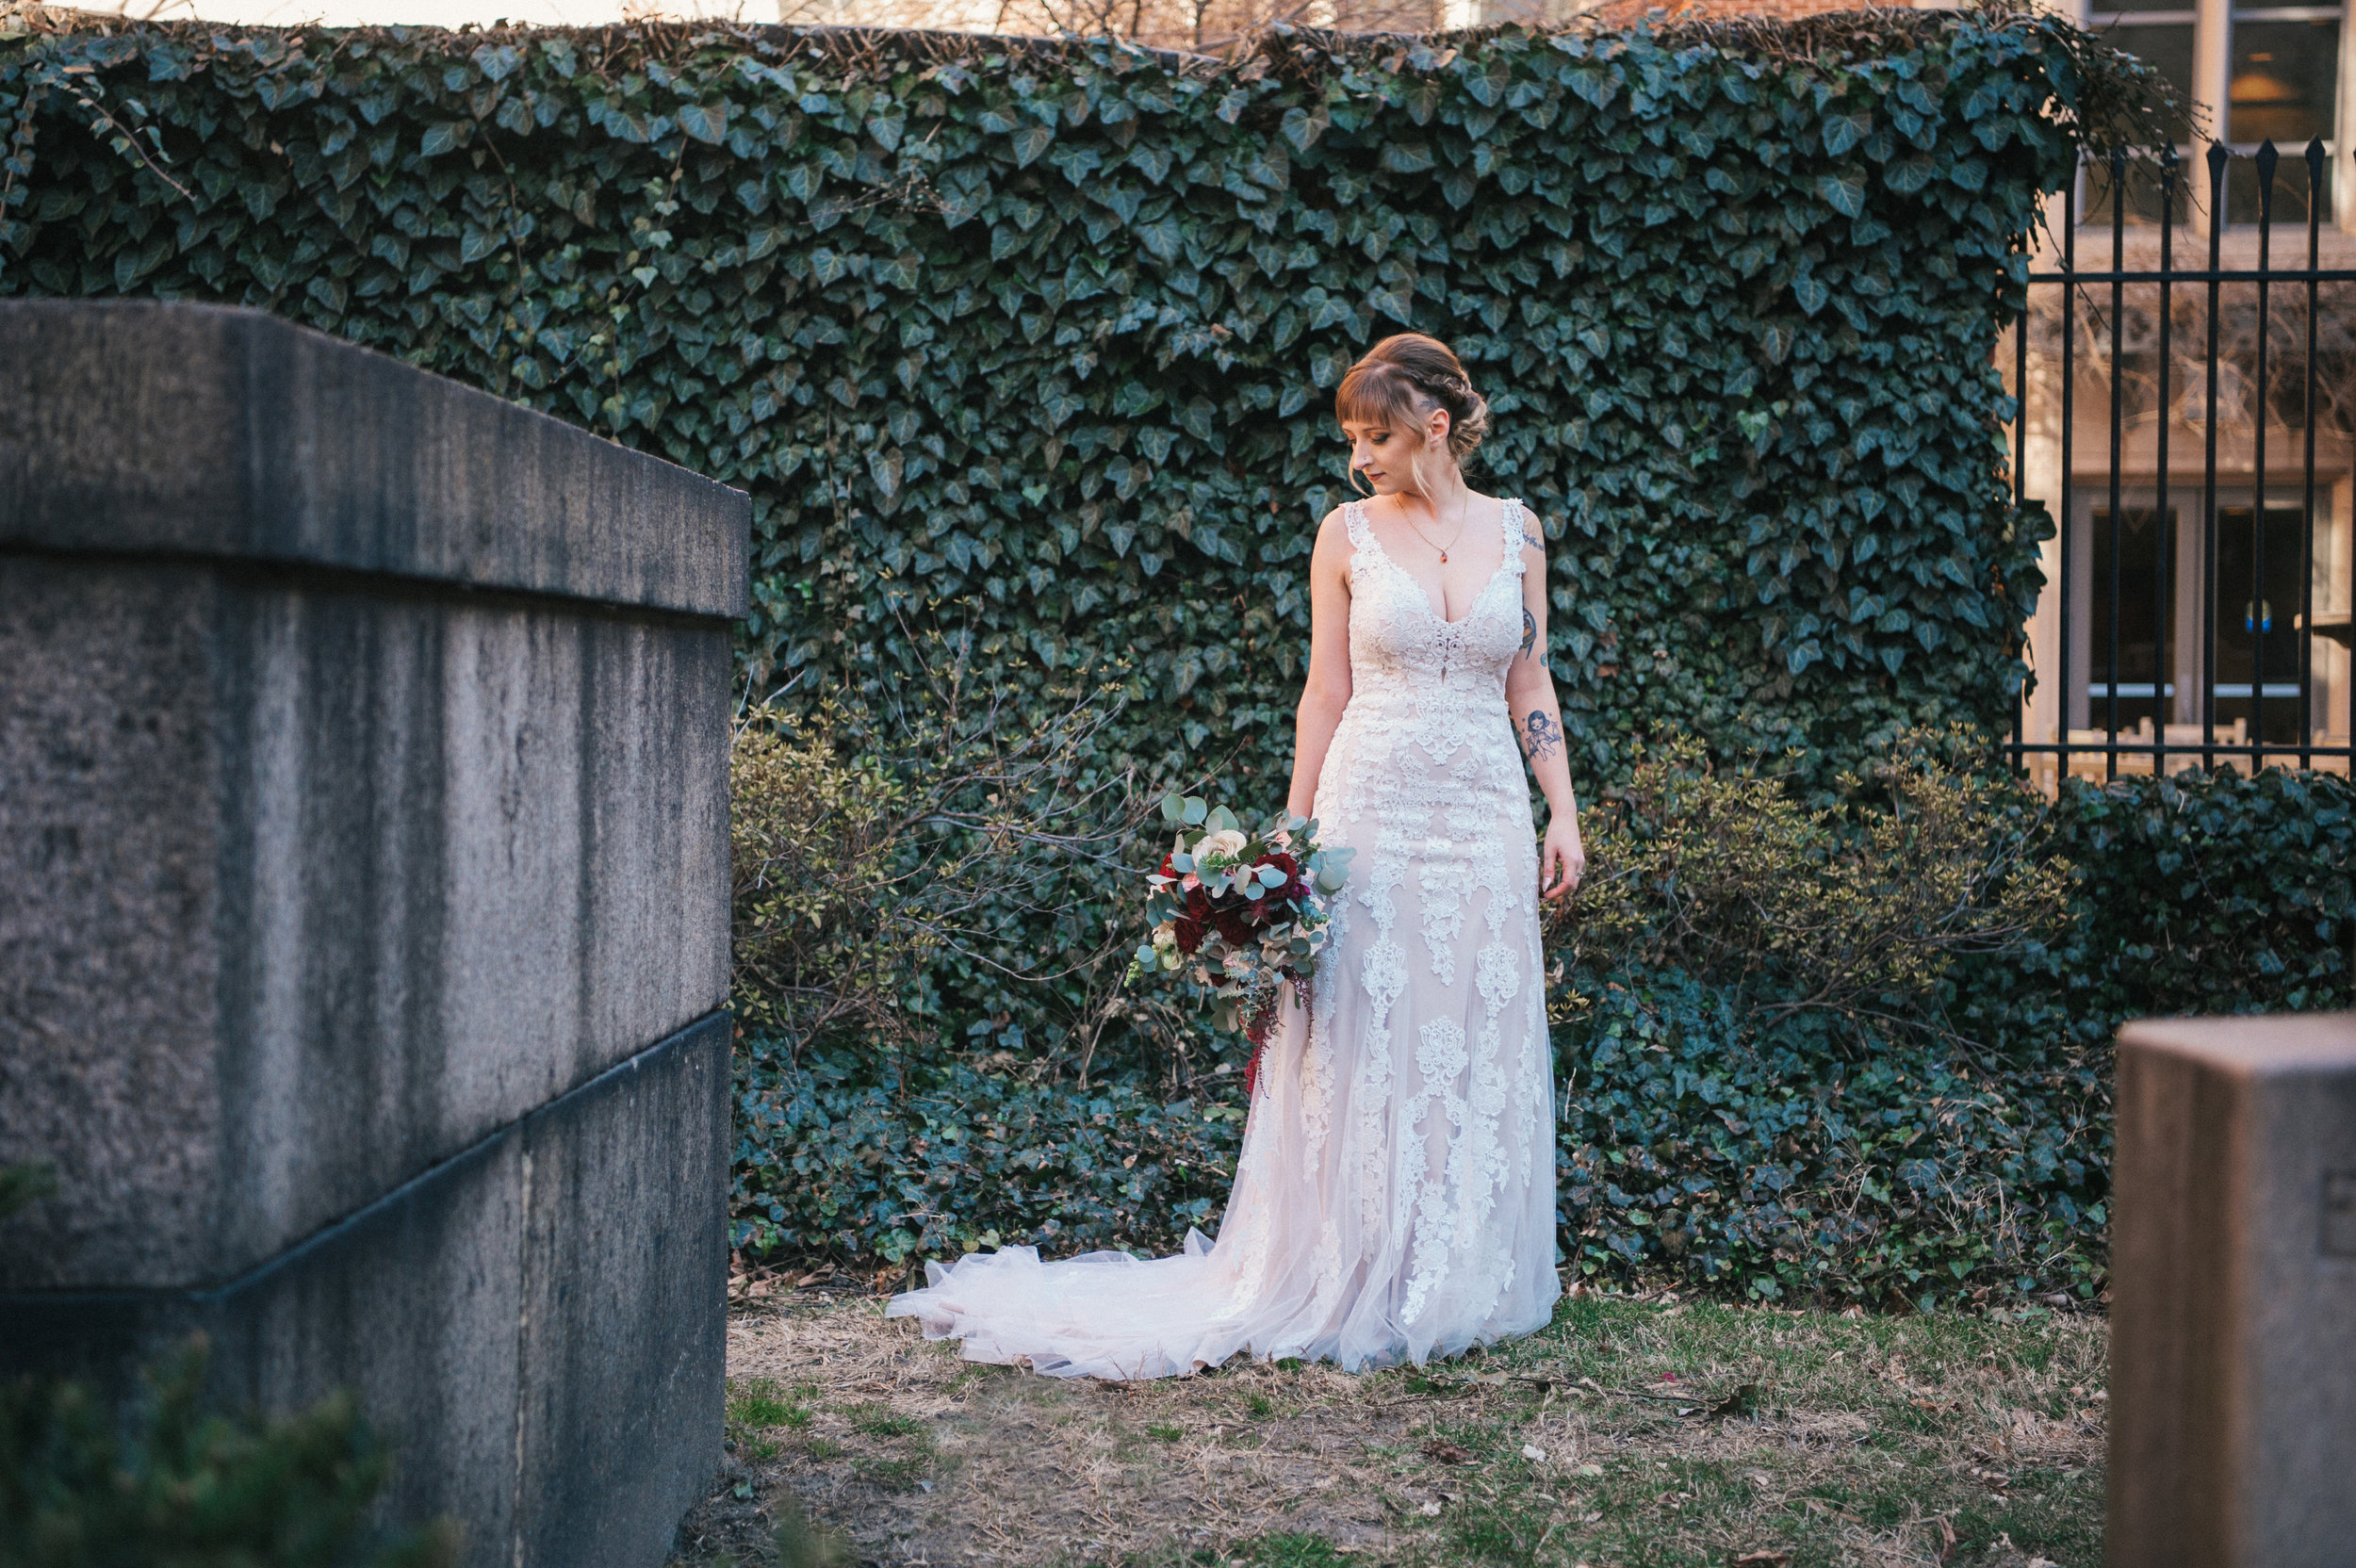 Amber and Kyles Wedding 18.jpg